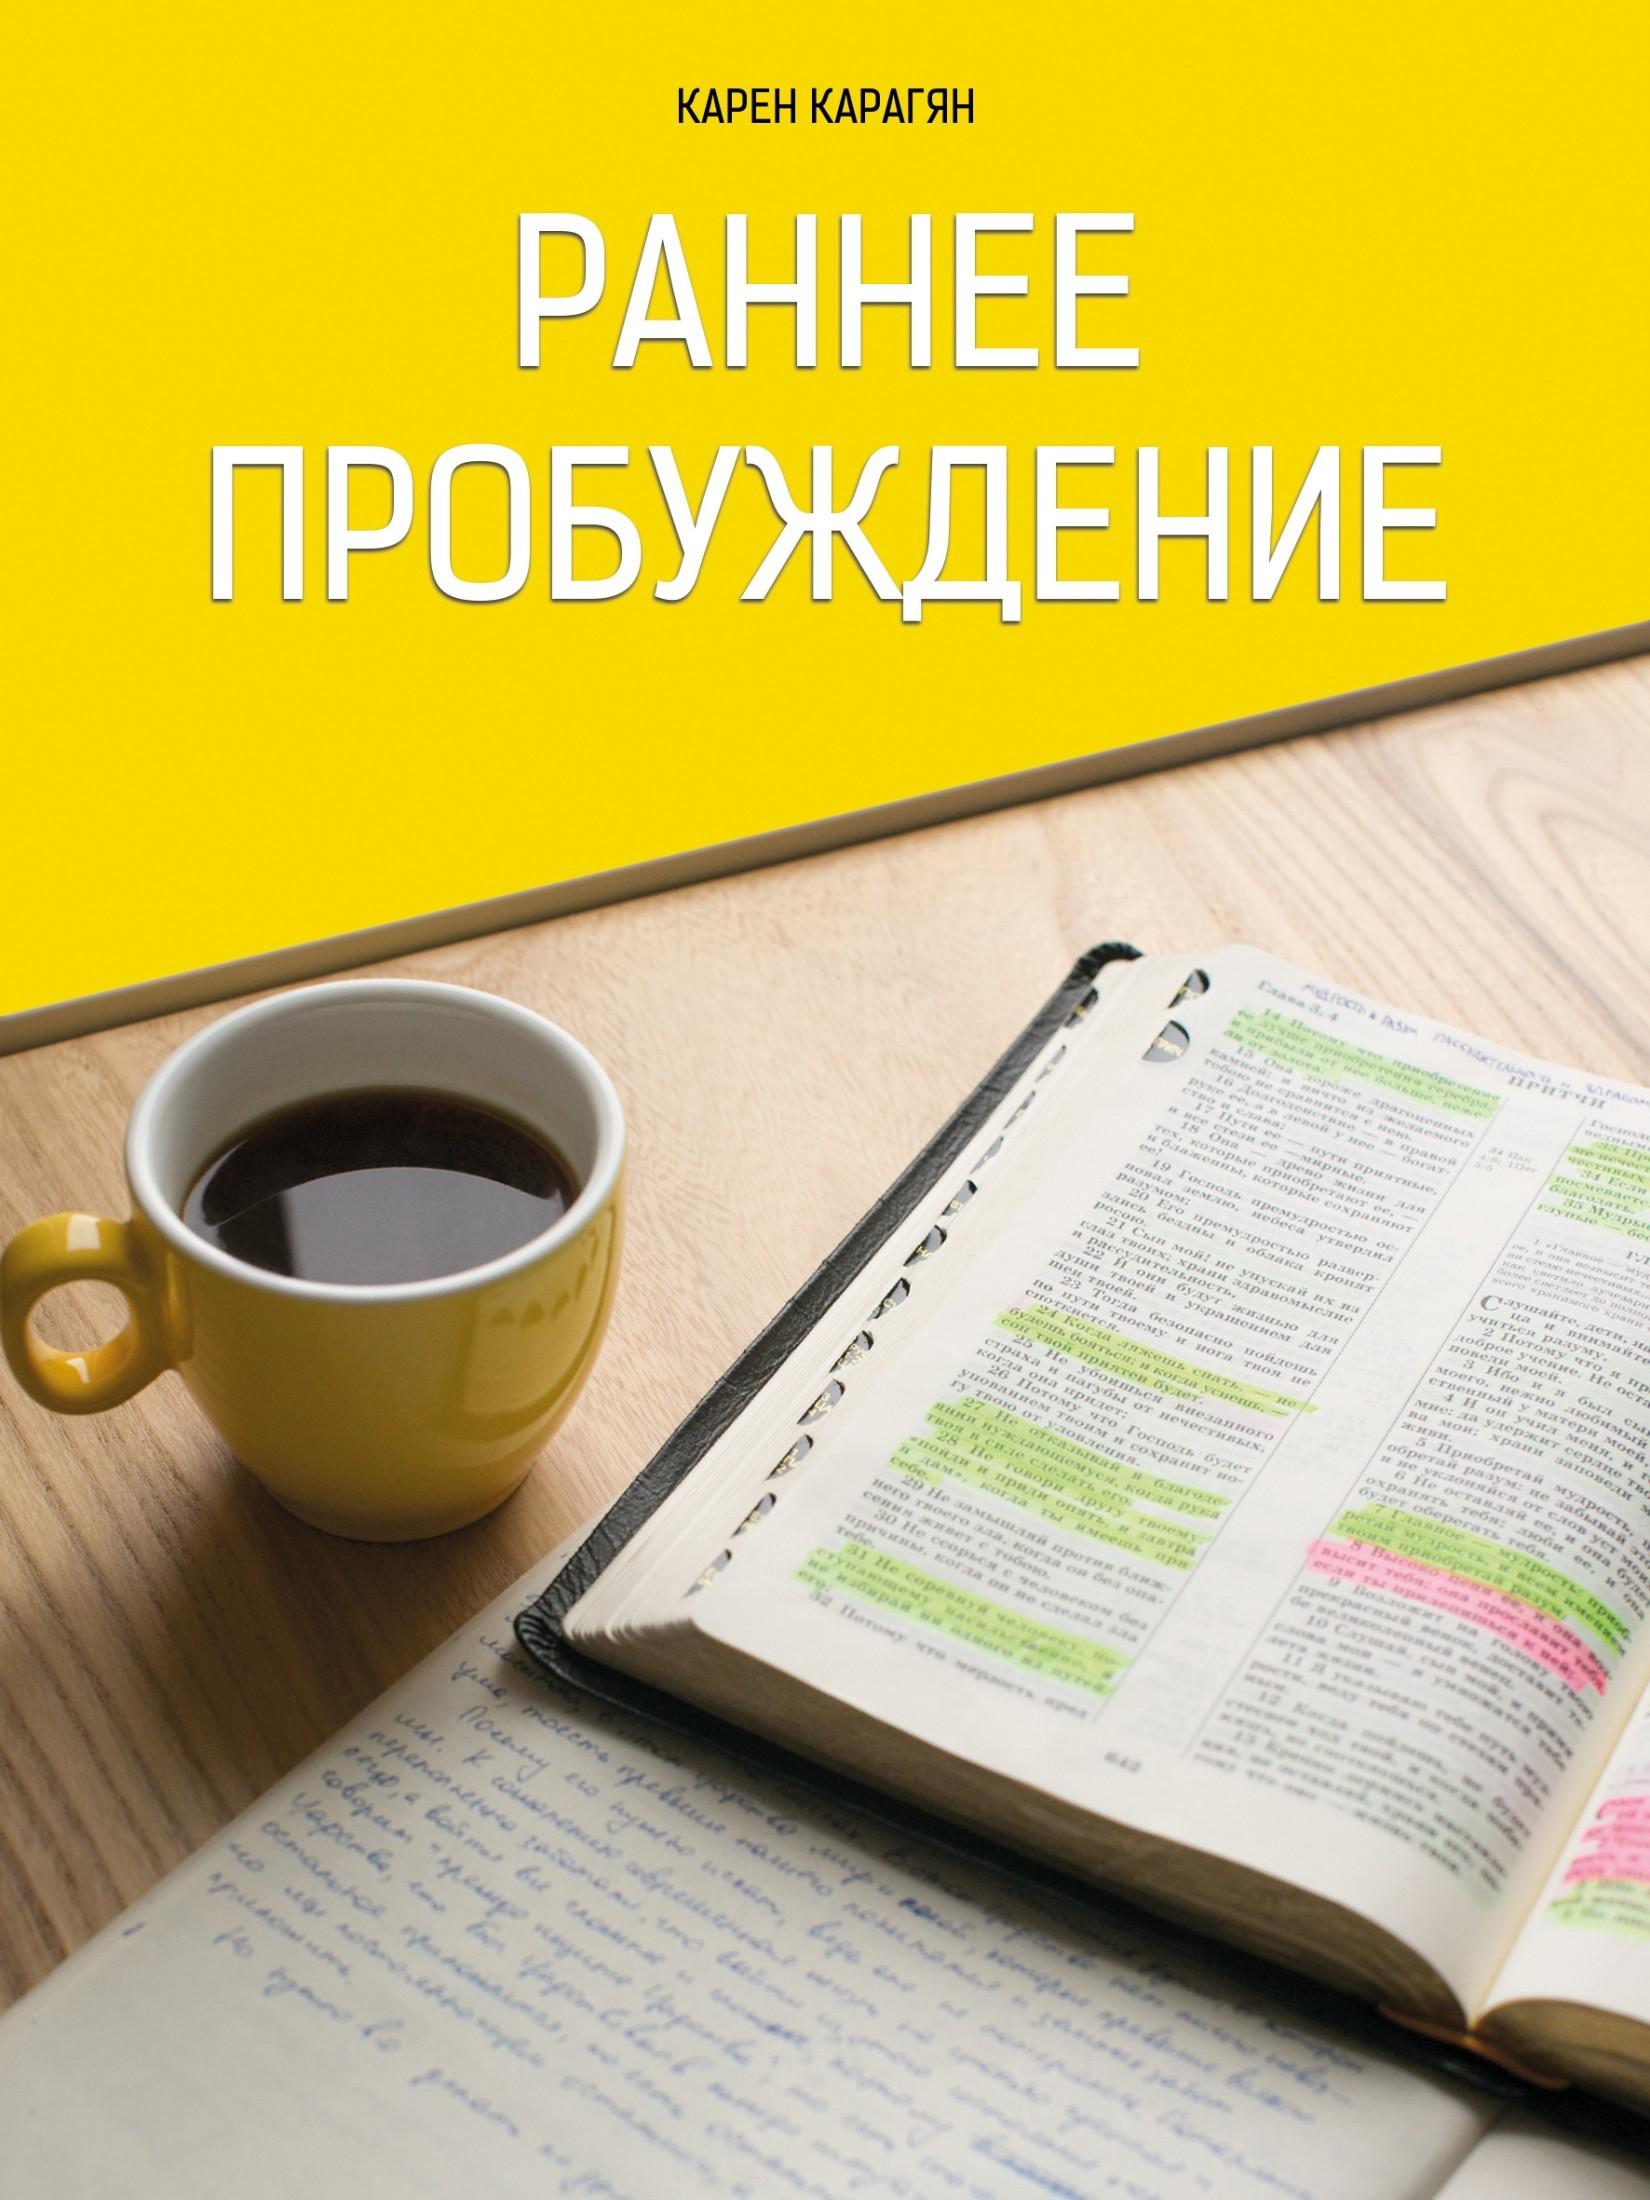 обложка книги static/bookimages/26/66/91/26669121.bin.dir/26669121.cover.jpg